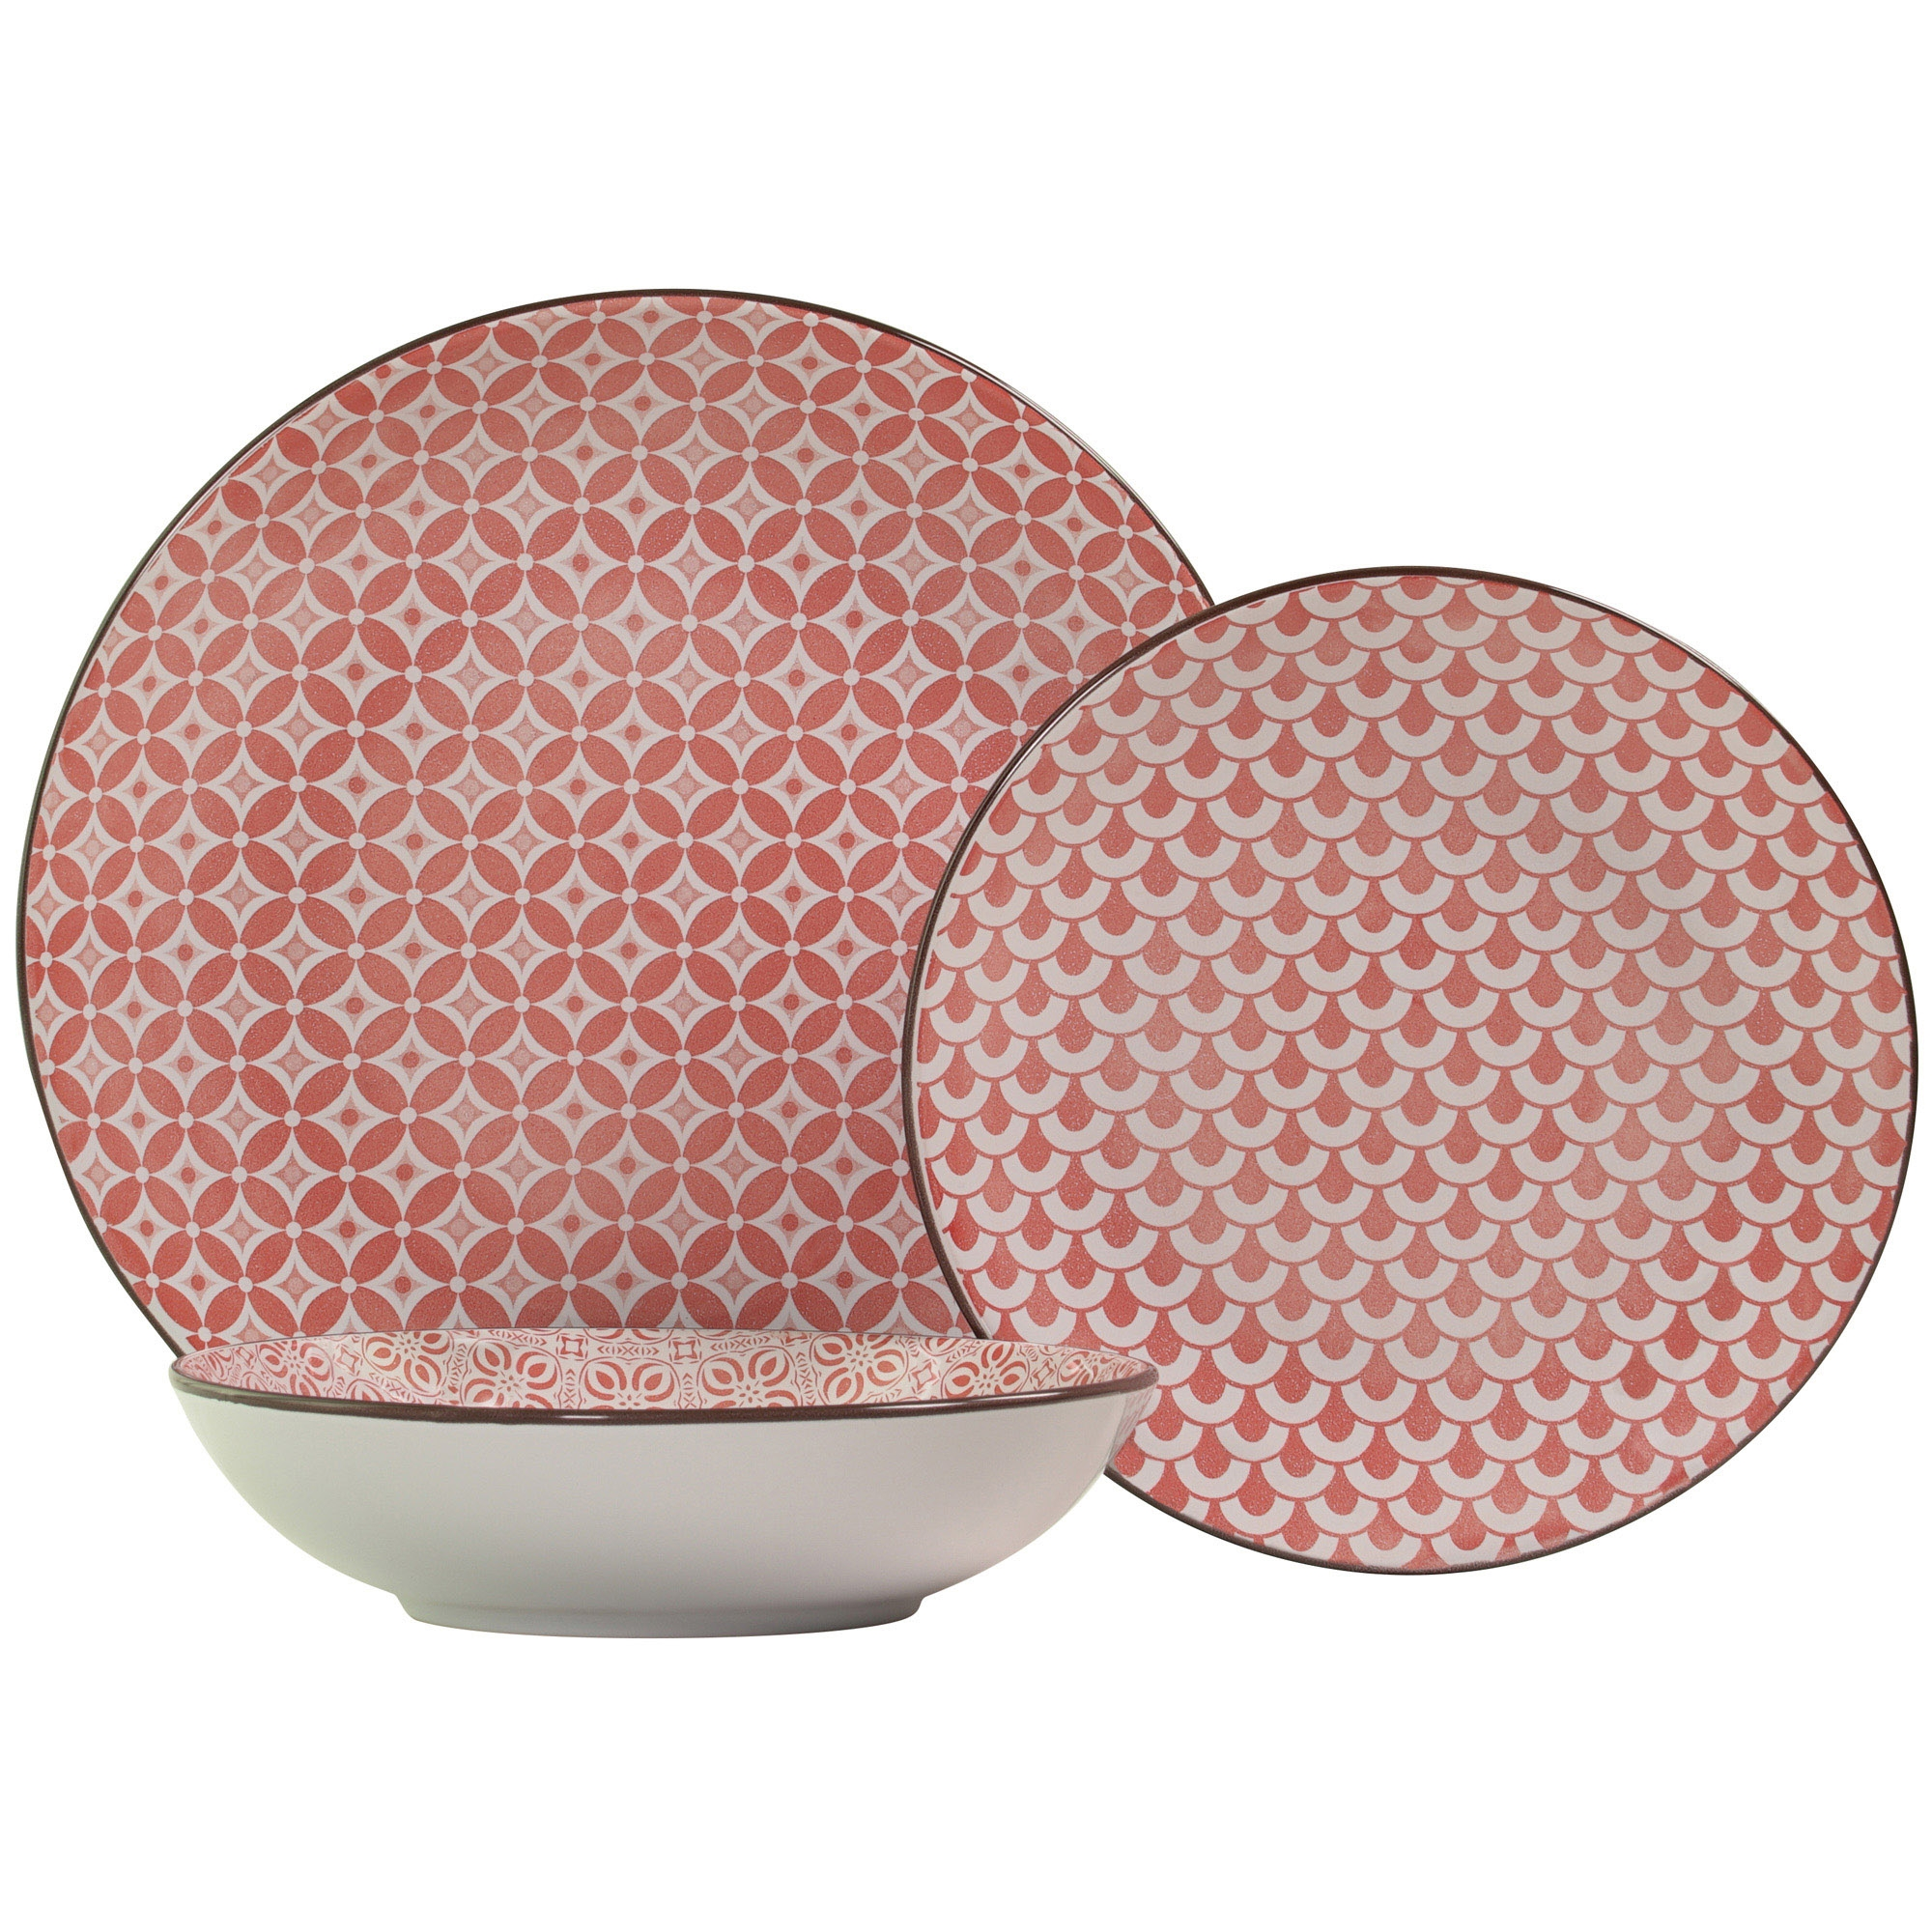 "Set of 8 Mainstays 10.5"" Pink Dinner Plates Glass//Stoneware"